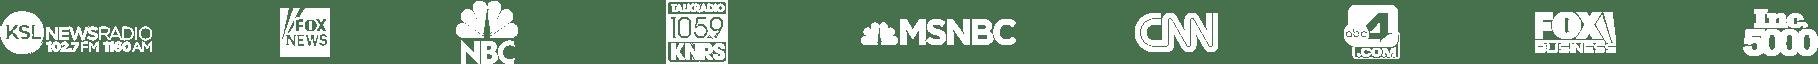 media-logos-top